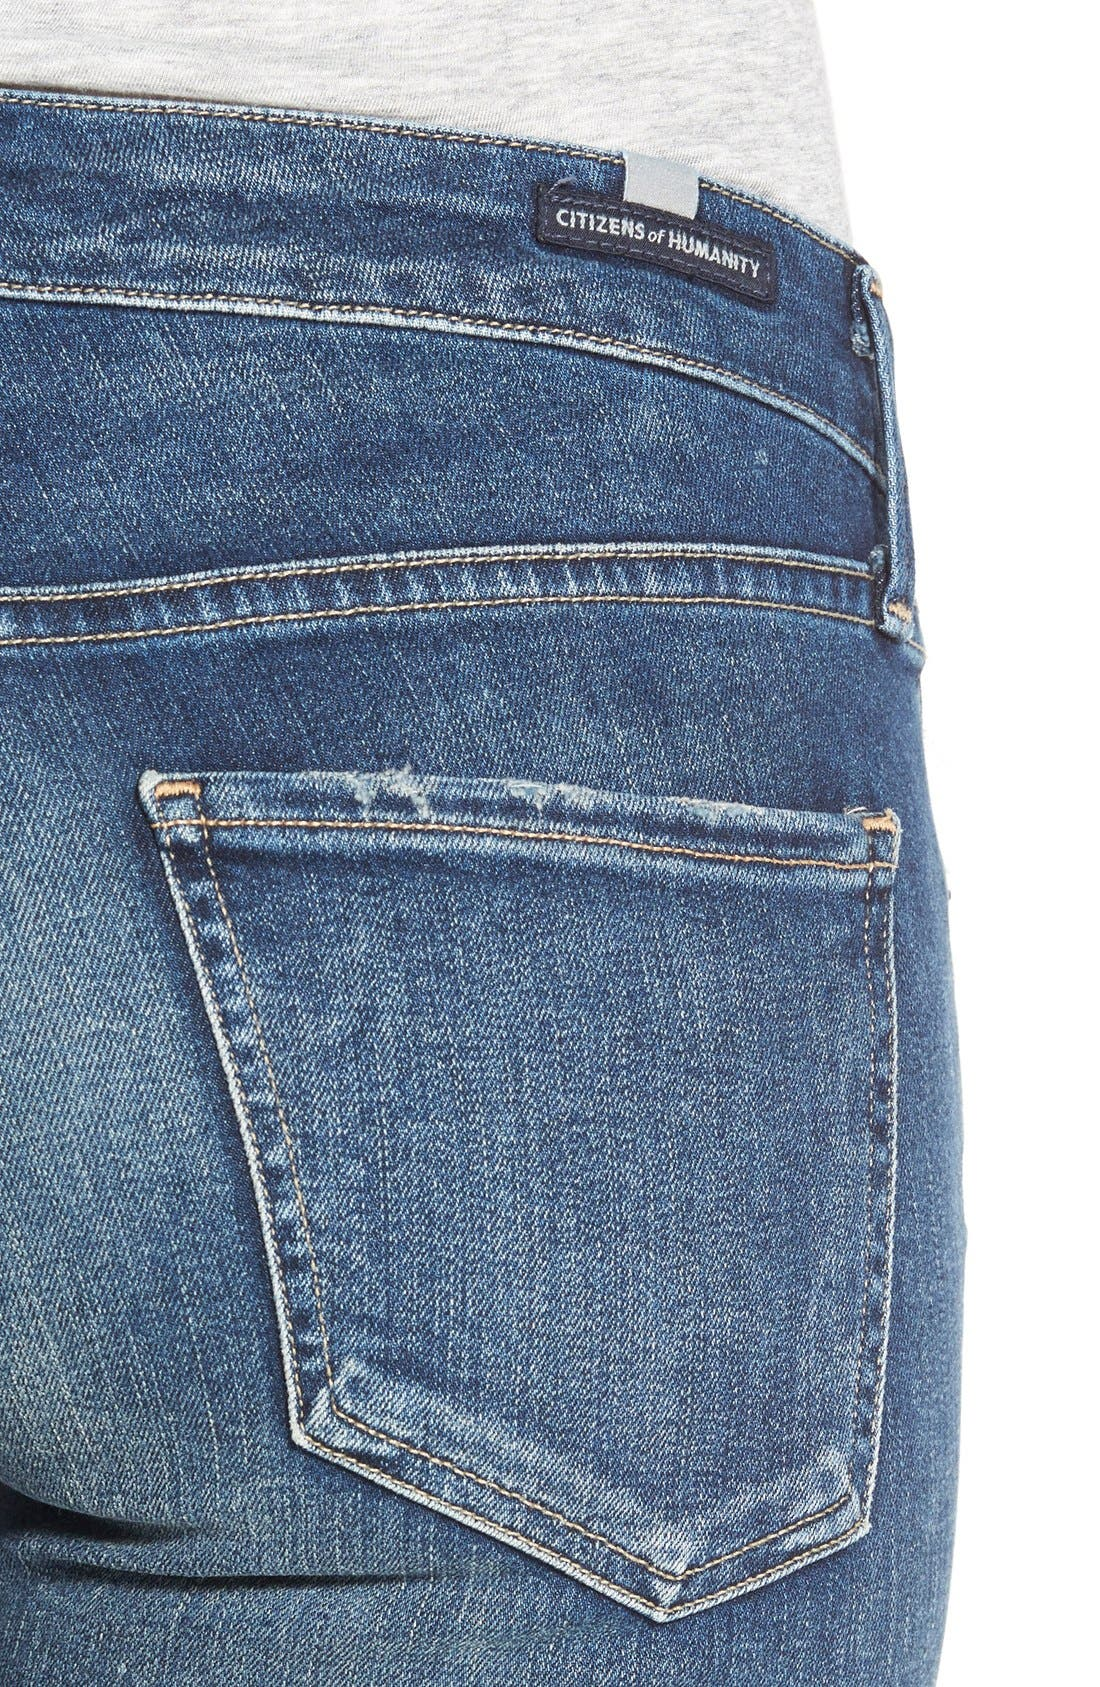 'Arielle' Skinny Jeans,                             Alternate thumbnail 5, color,                             400